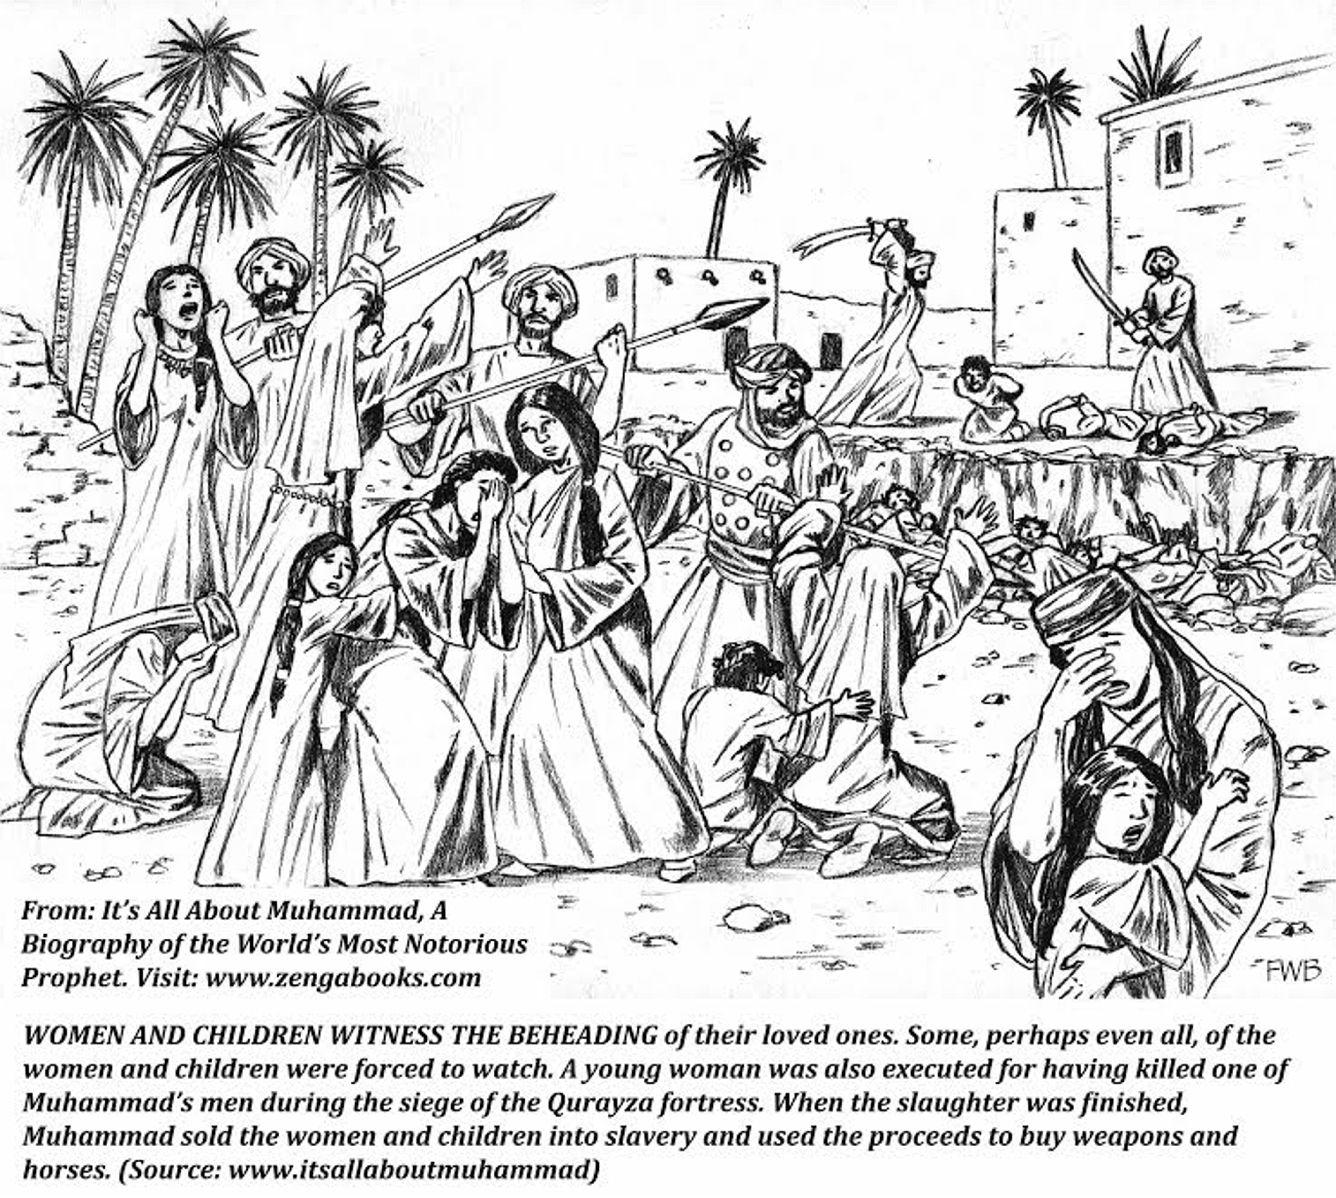 Devrimci Aleviler Birliği DAB Alevi Kızılbaş Bektaşi pir sultan cem hz Ali 12 imam semah Feramuz Şah Acar geno3 Banu qurayza imam ali